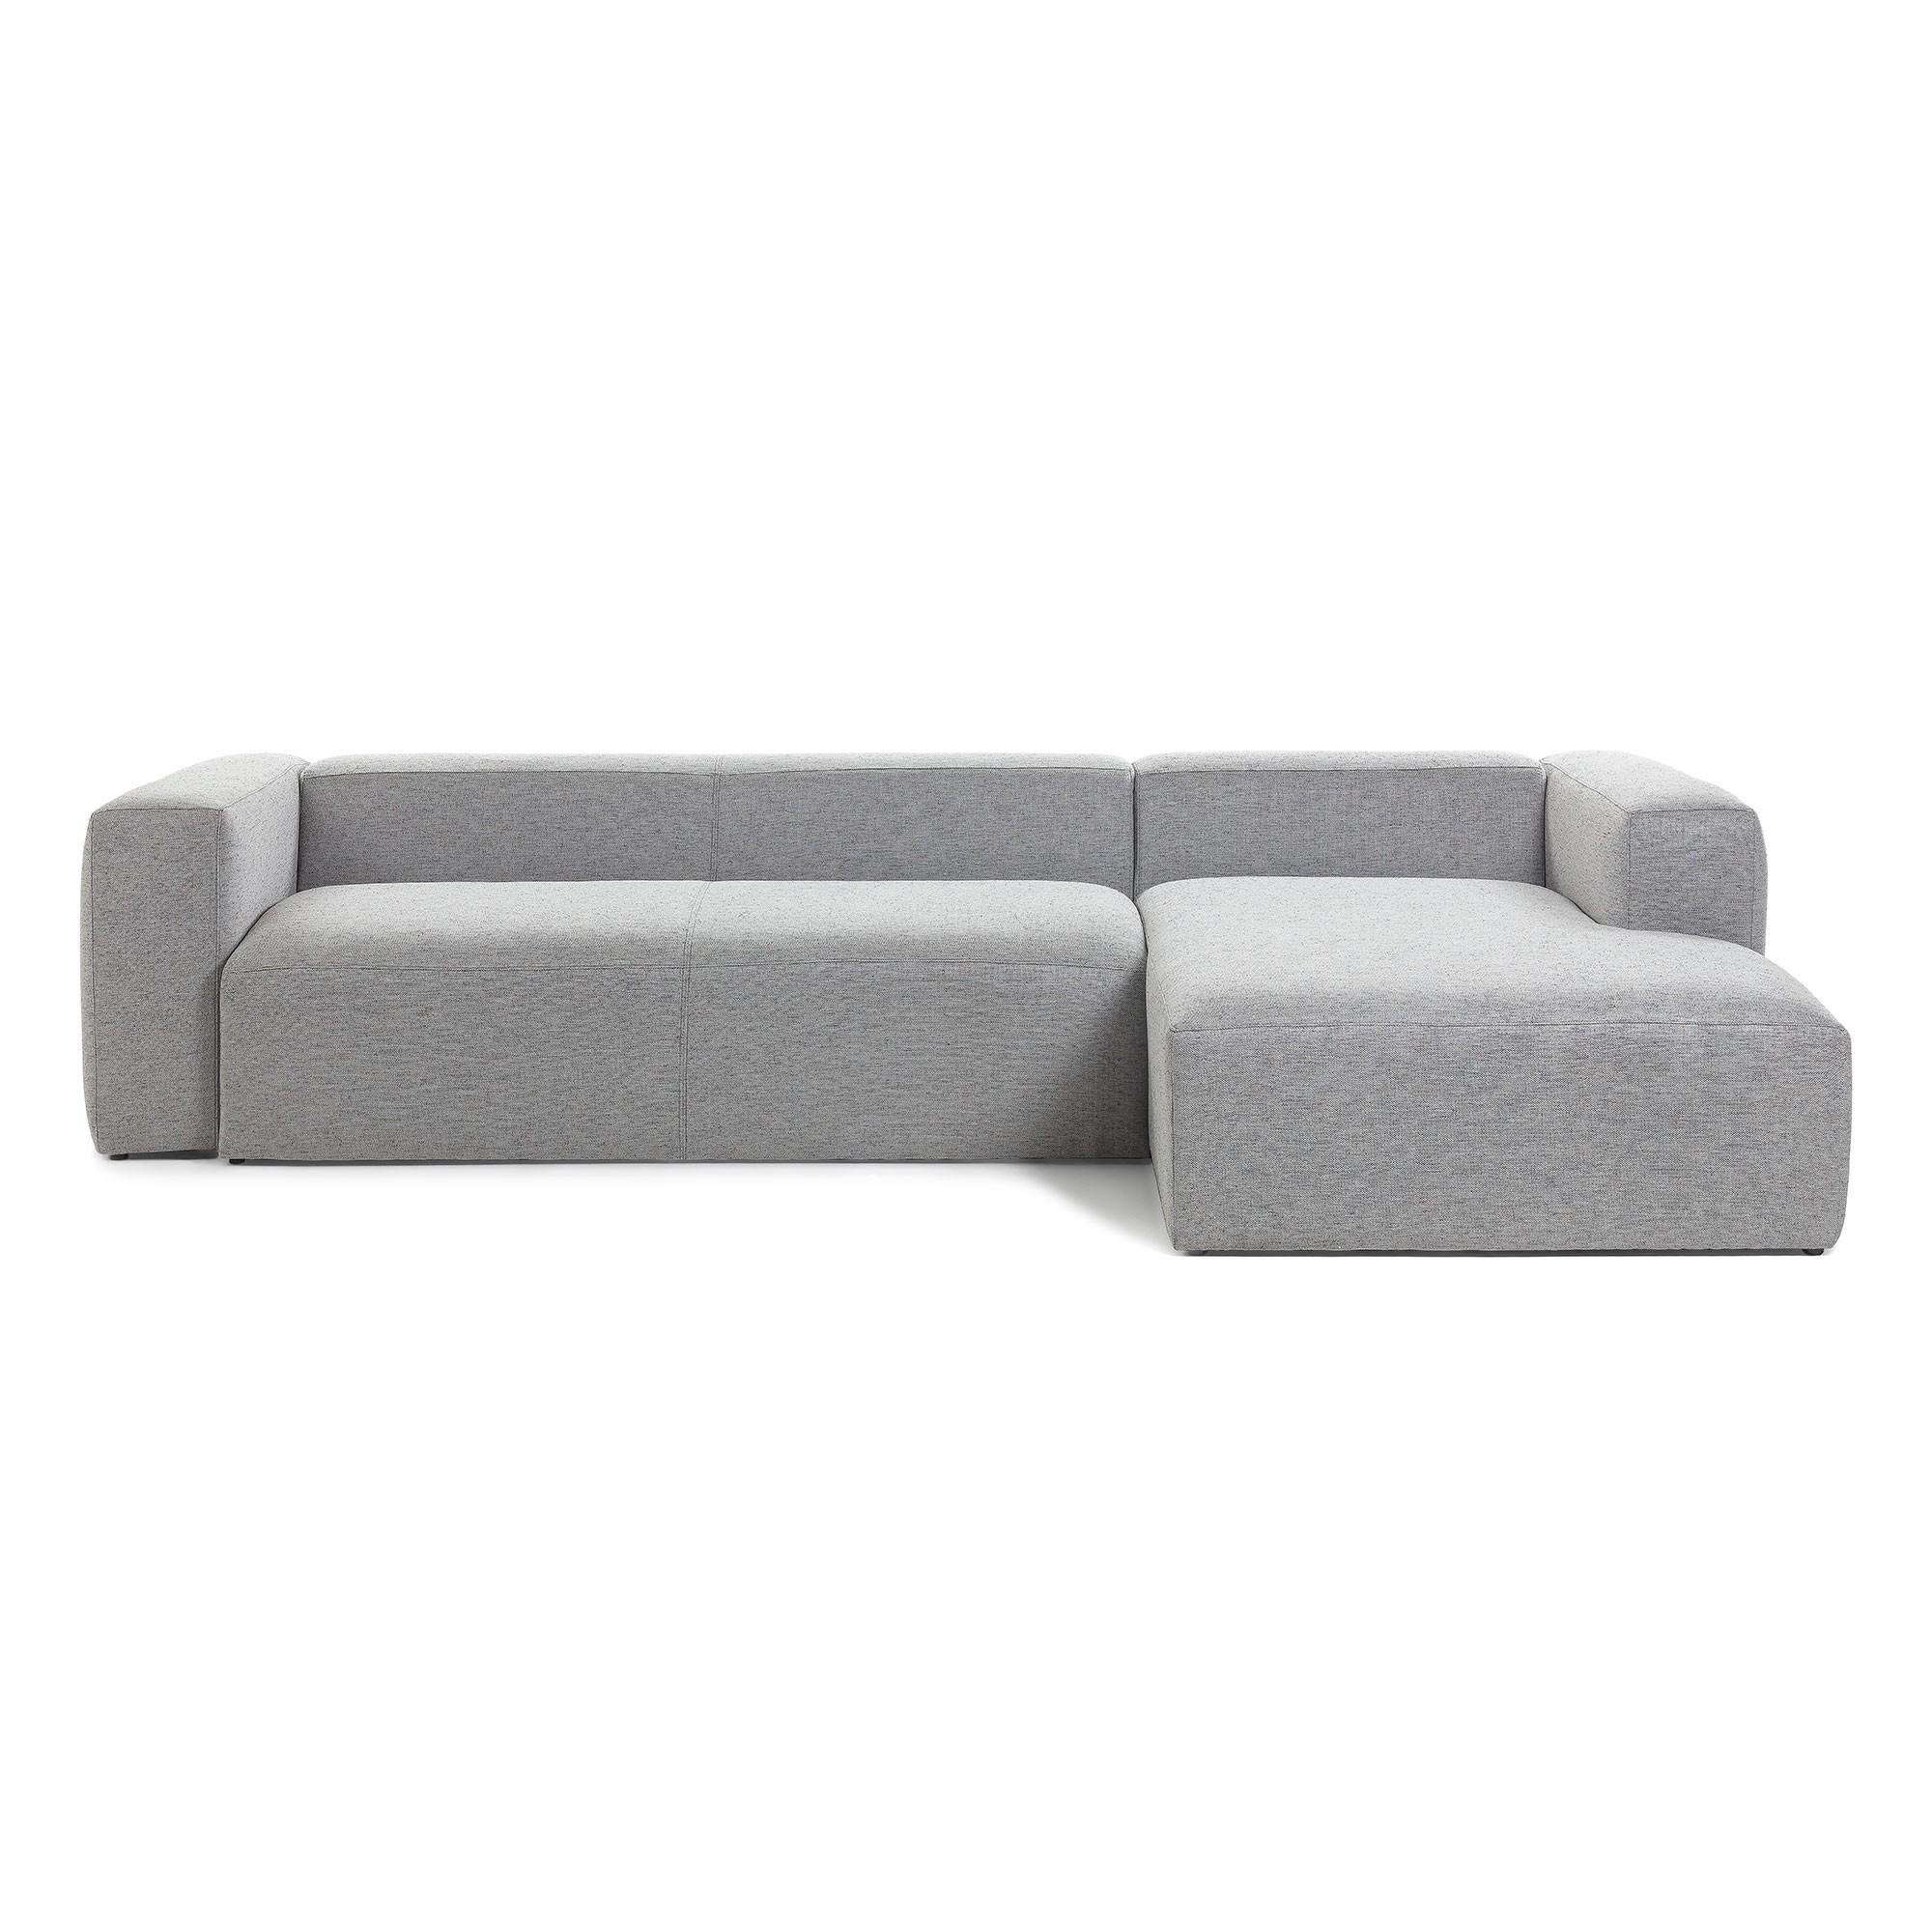 Lorton Fabric Corner Sofa, 2 Seater with RHF Chaise, Light Grey